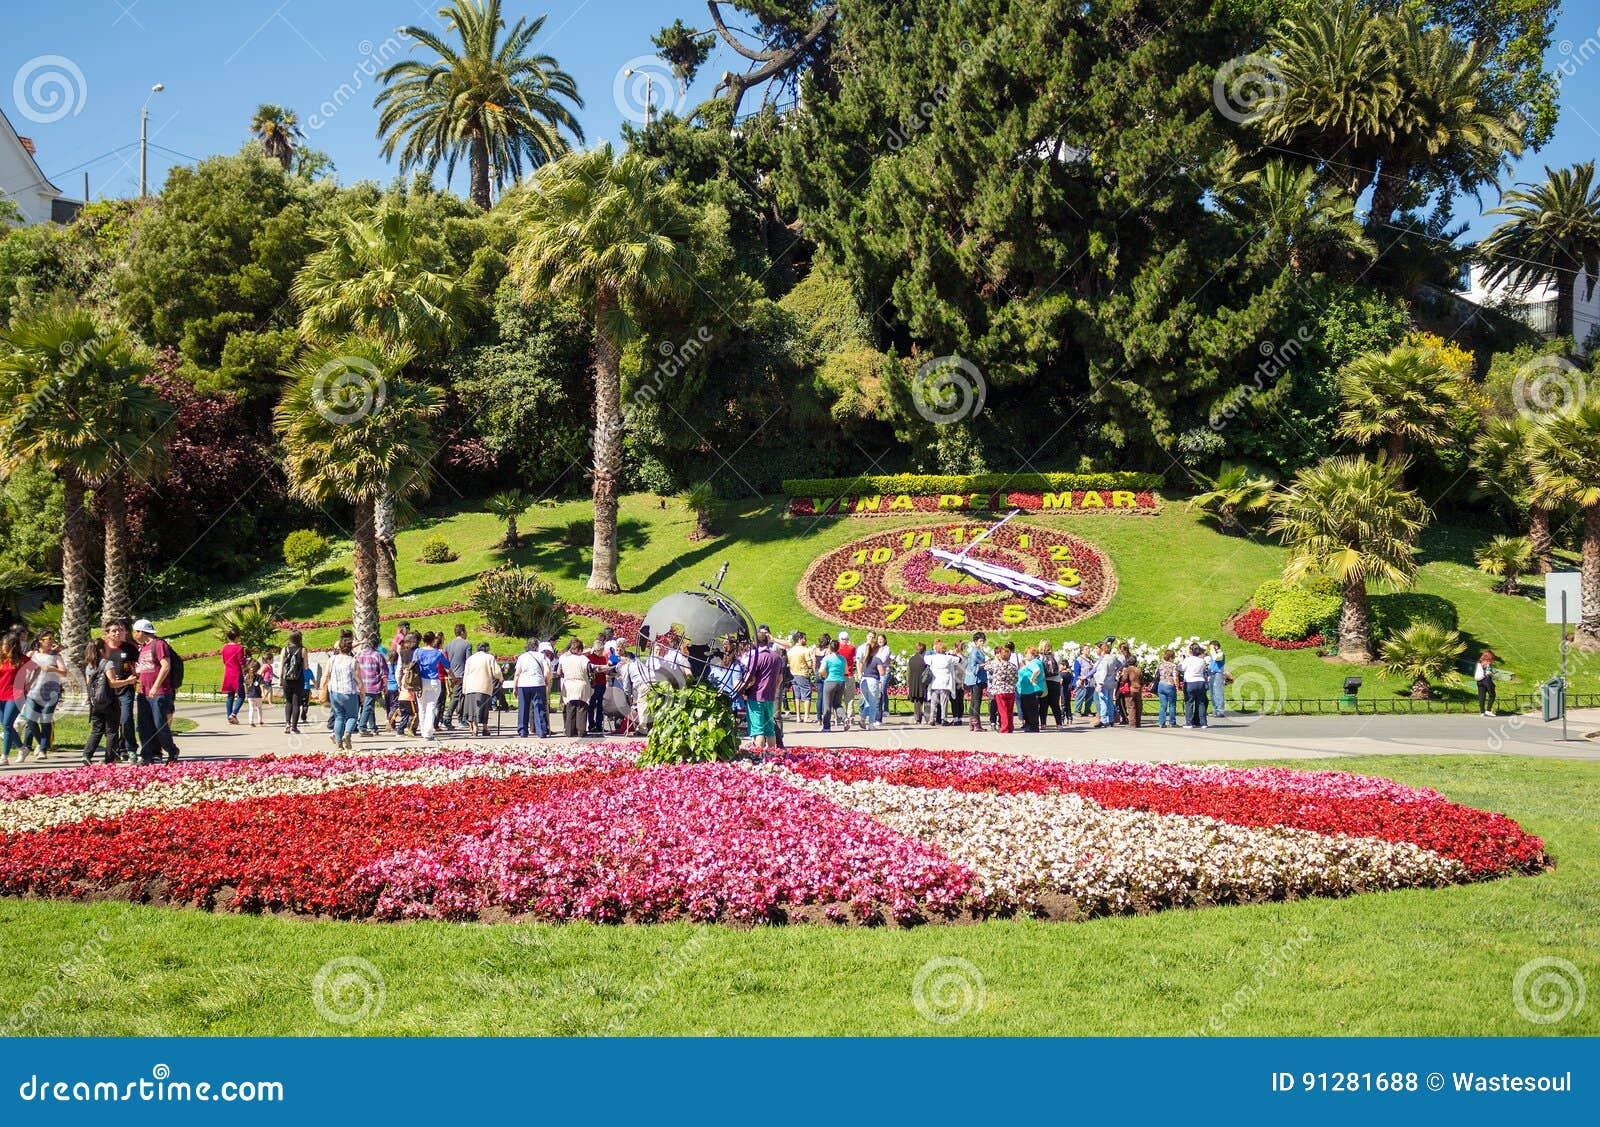 Turister som ser blomman, tar tid på Reloj de Flores i Vina D